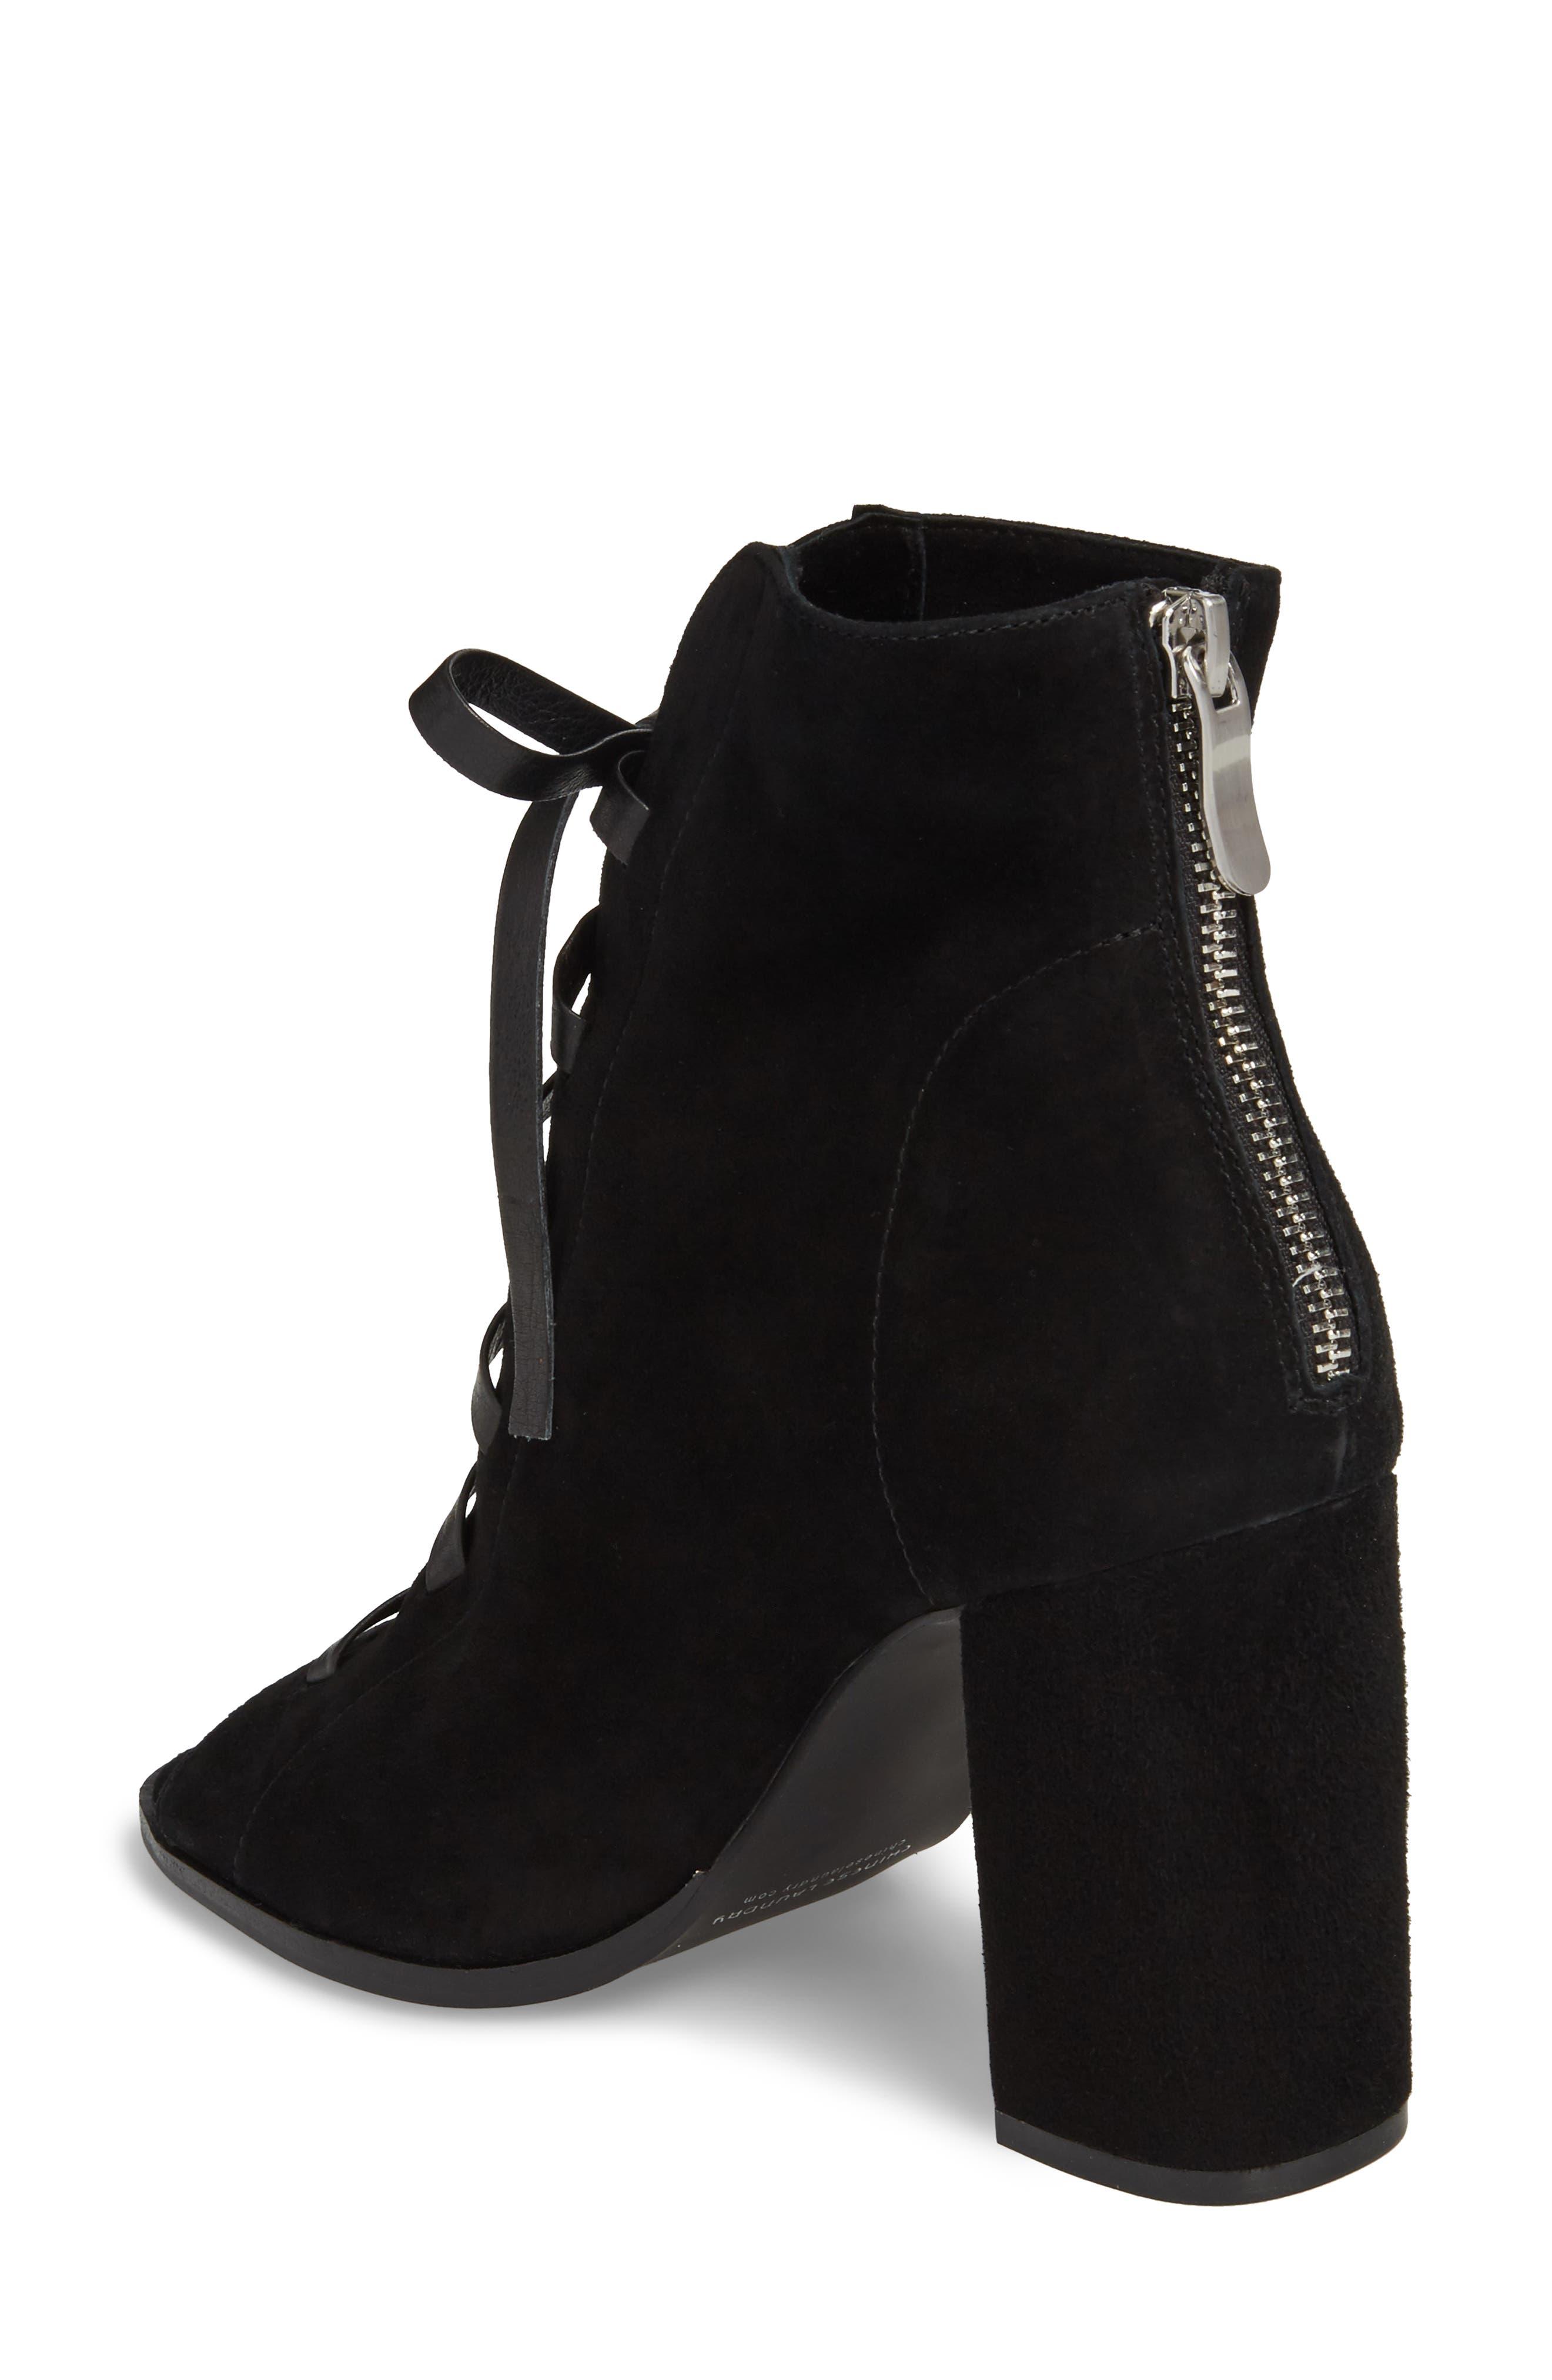 Alternate Image 2  - Kristin Cavallari Layton Lace-Up Boot (Women)